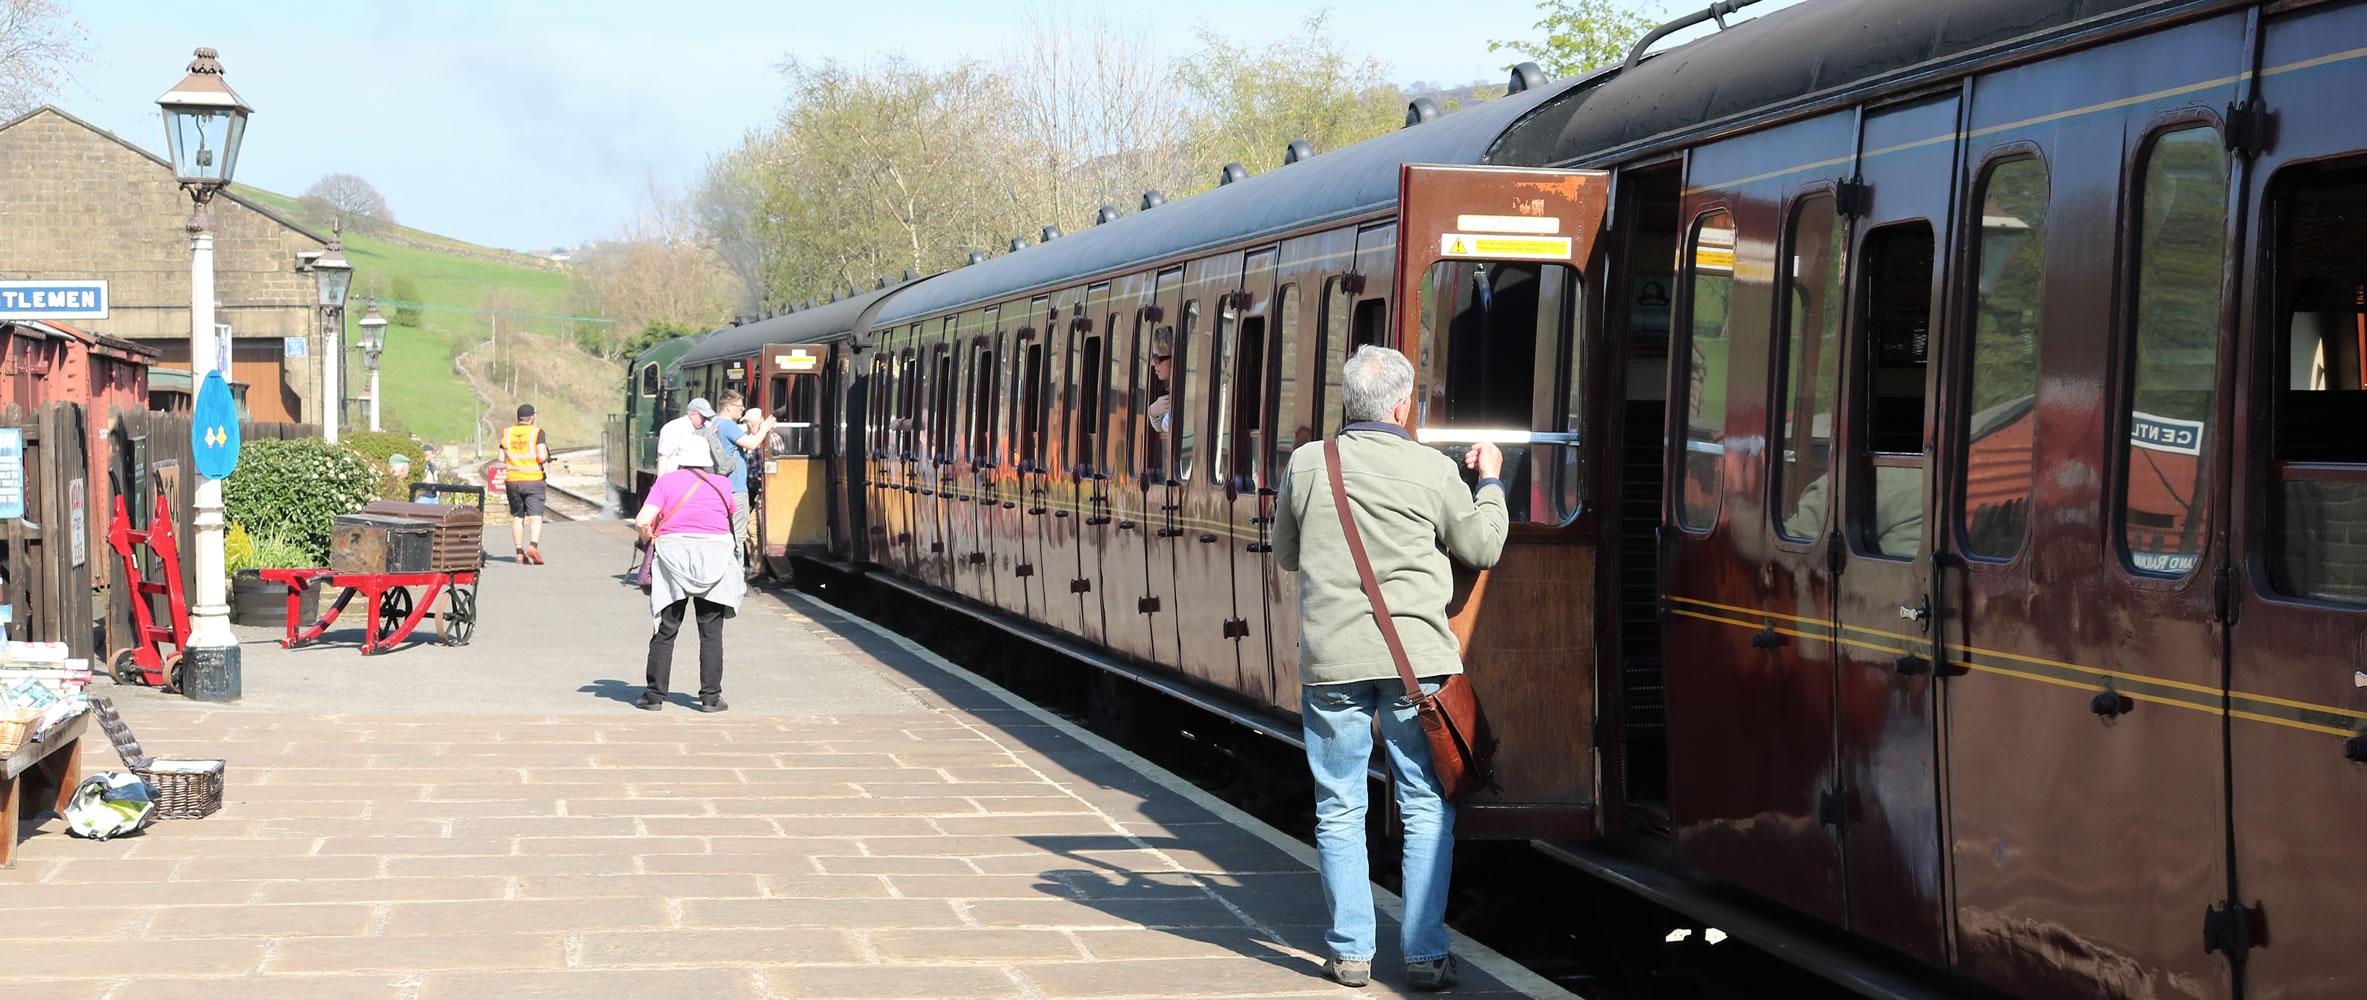 Train at oakworth station